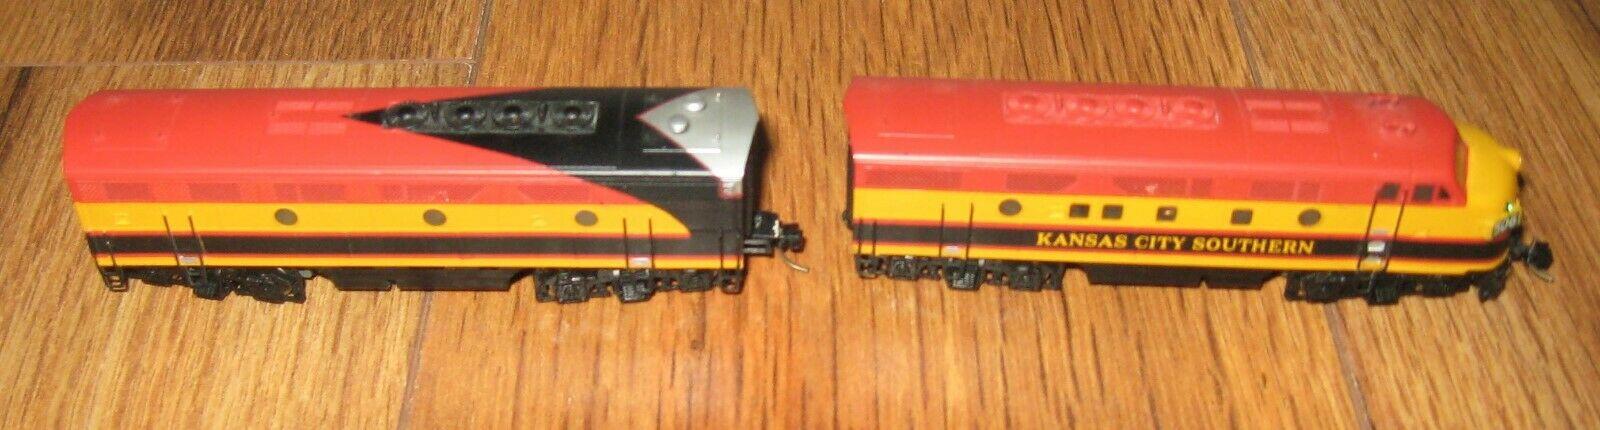 N Scale - Hallmark Models - 506 - Locomotive, Diesel, EMD F3 - Kansas City Southern - 506